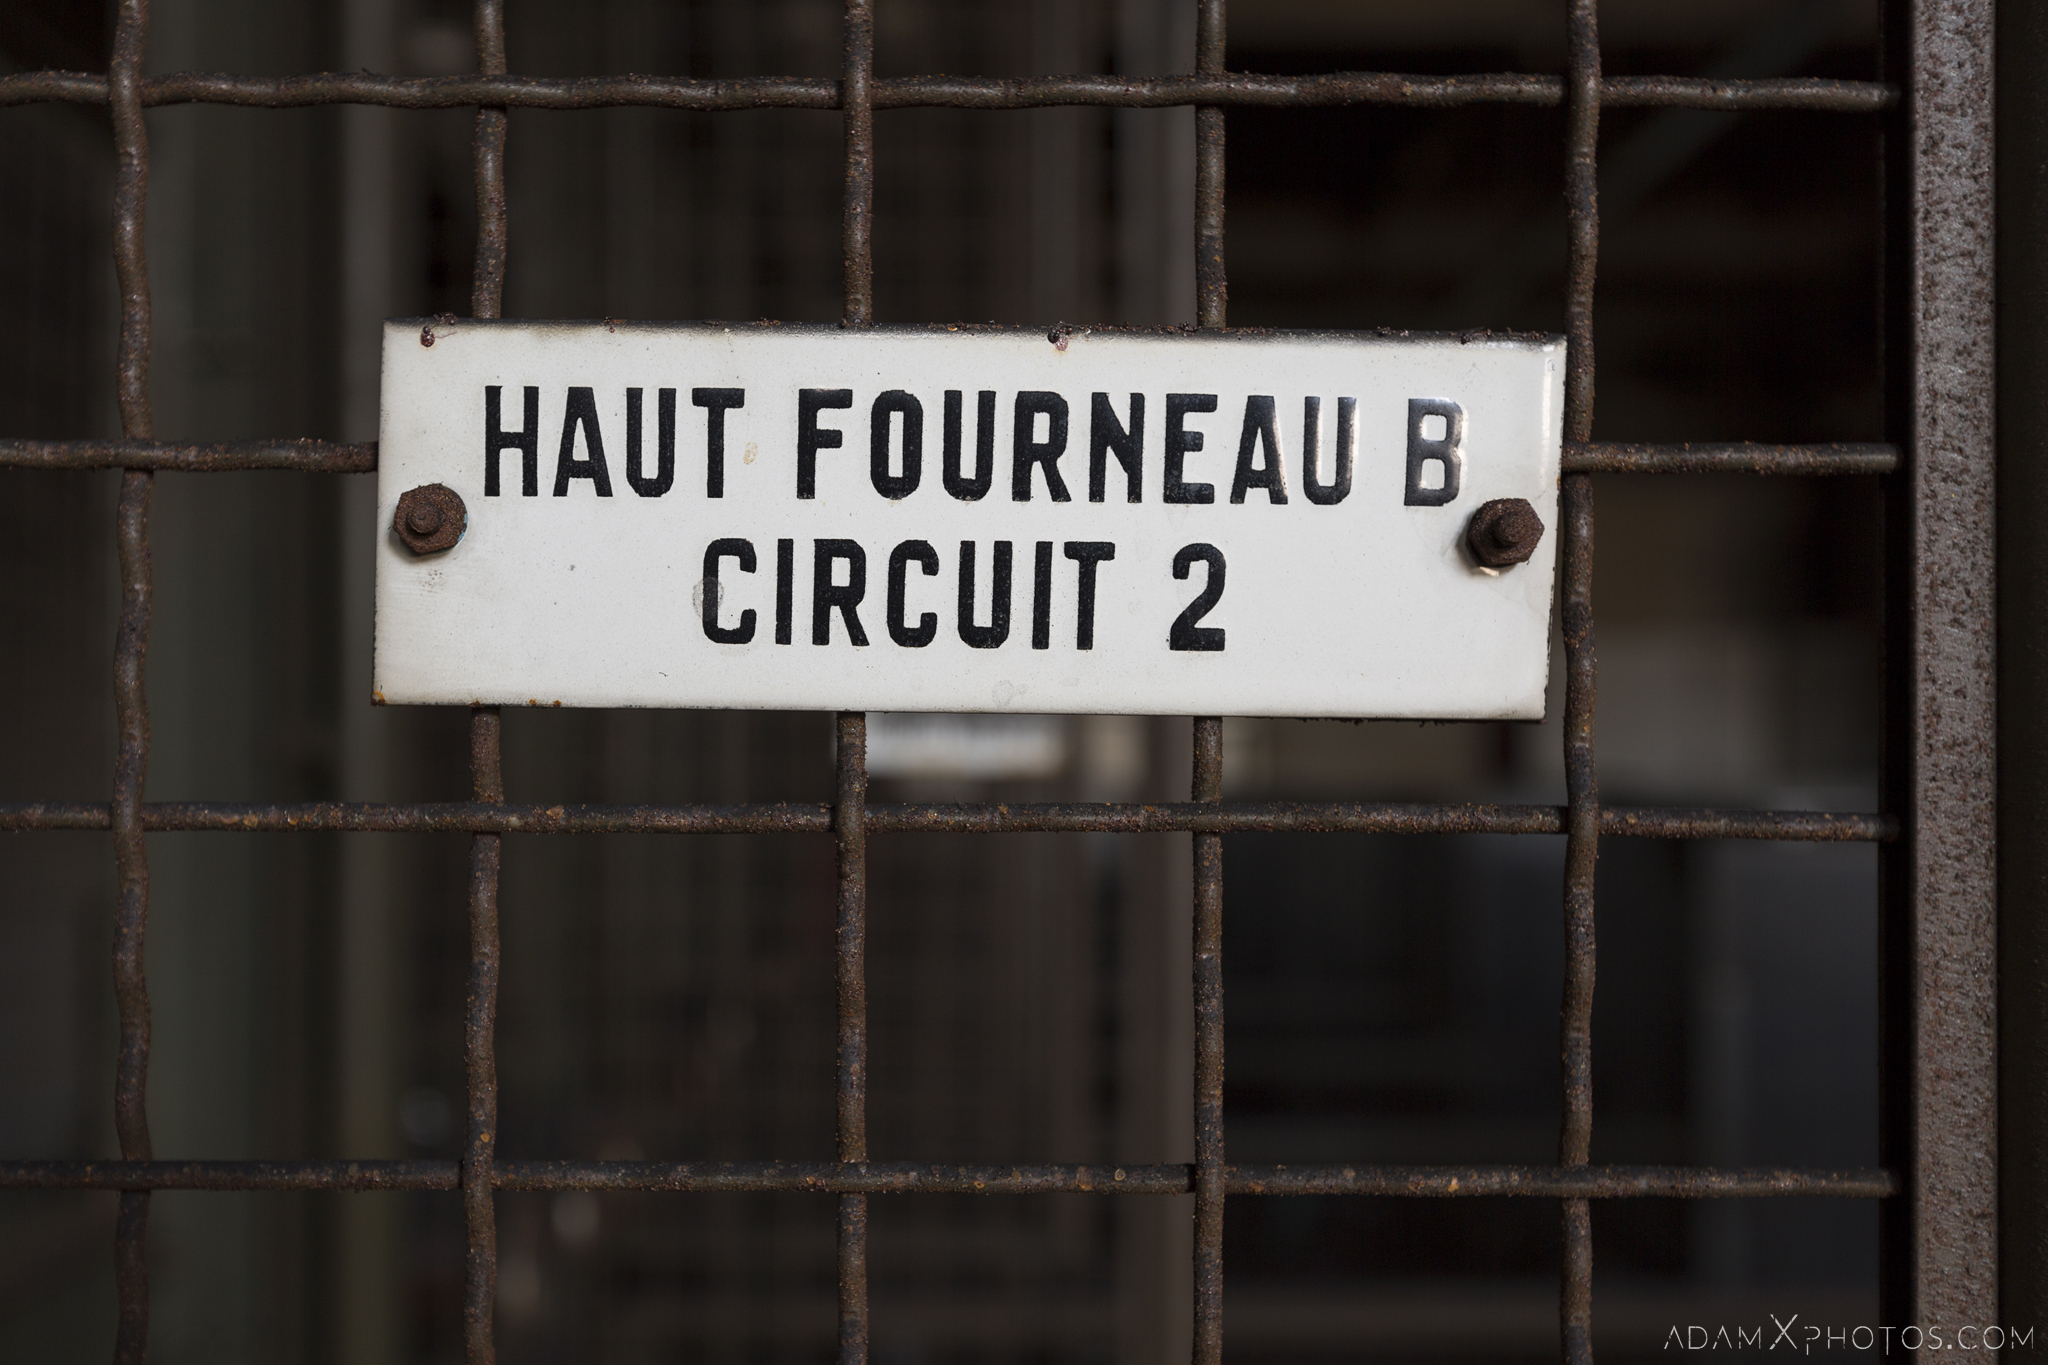 HFB sign Haut Fourneau B HFB Blast Furnace Steelworks Adam X Urban Exploration Belgium Access 2017 Abandoned decay lost forgotten derelict location creepy haunting eerie